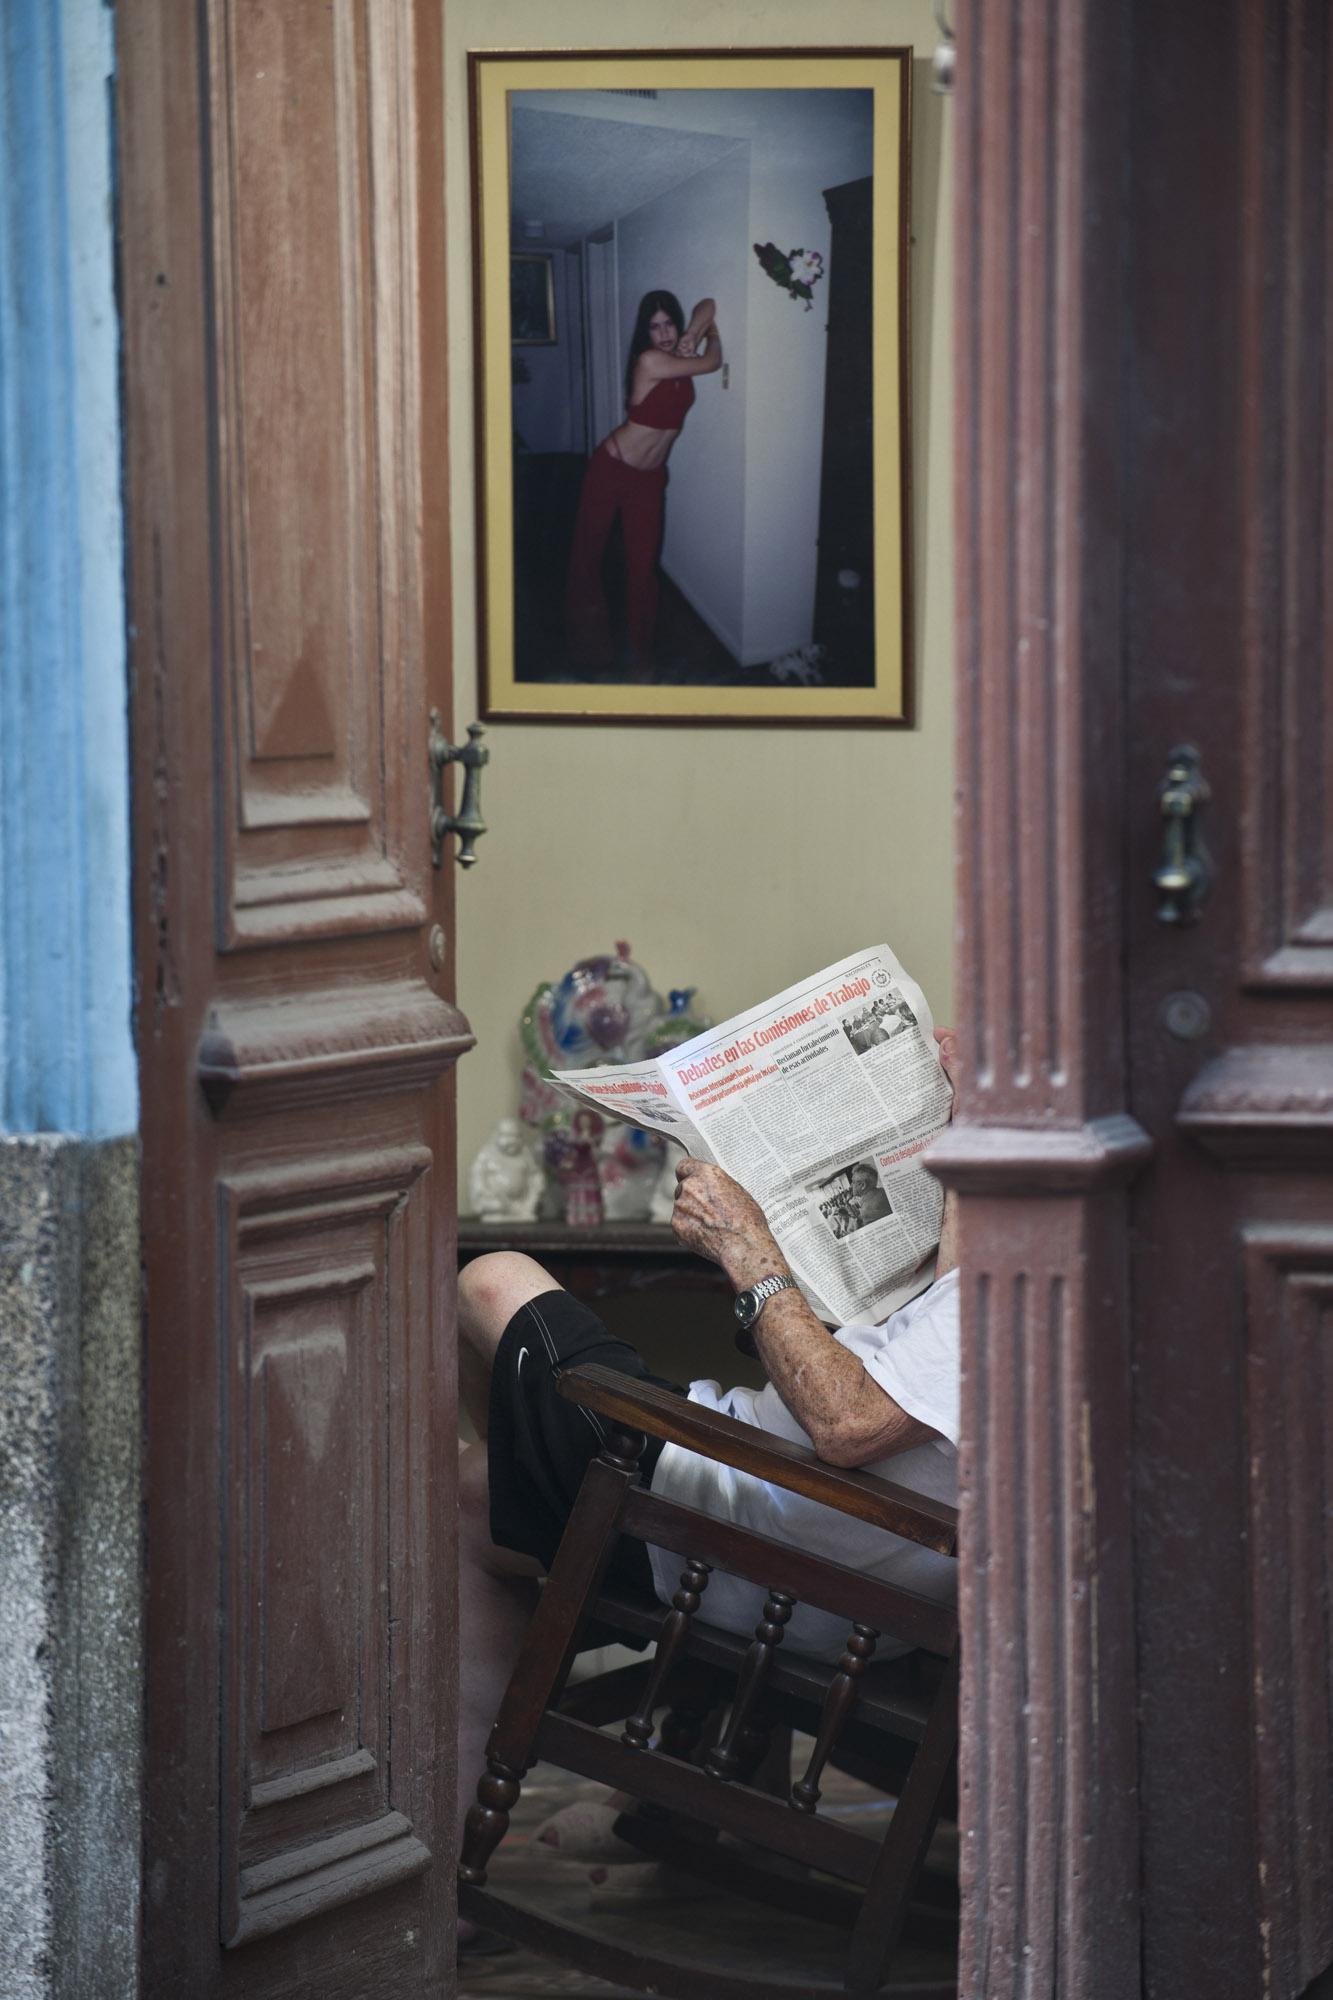 Interior 1 - Cuba - Hector Garrido, Aerial and human photography